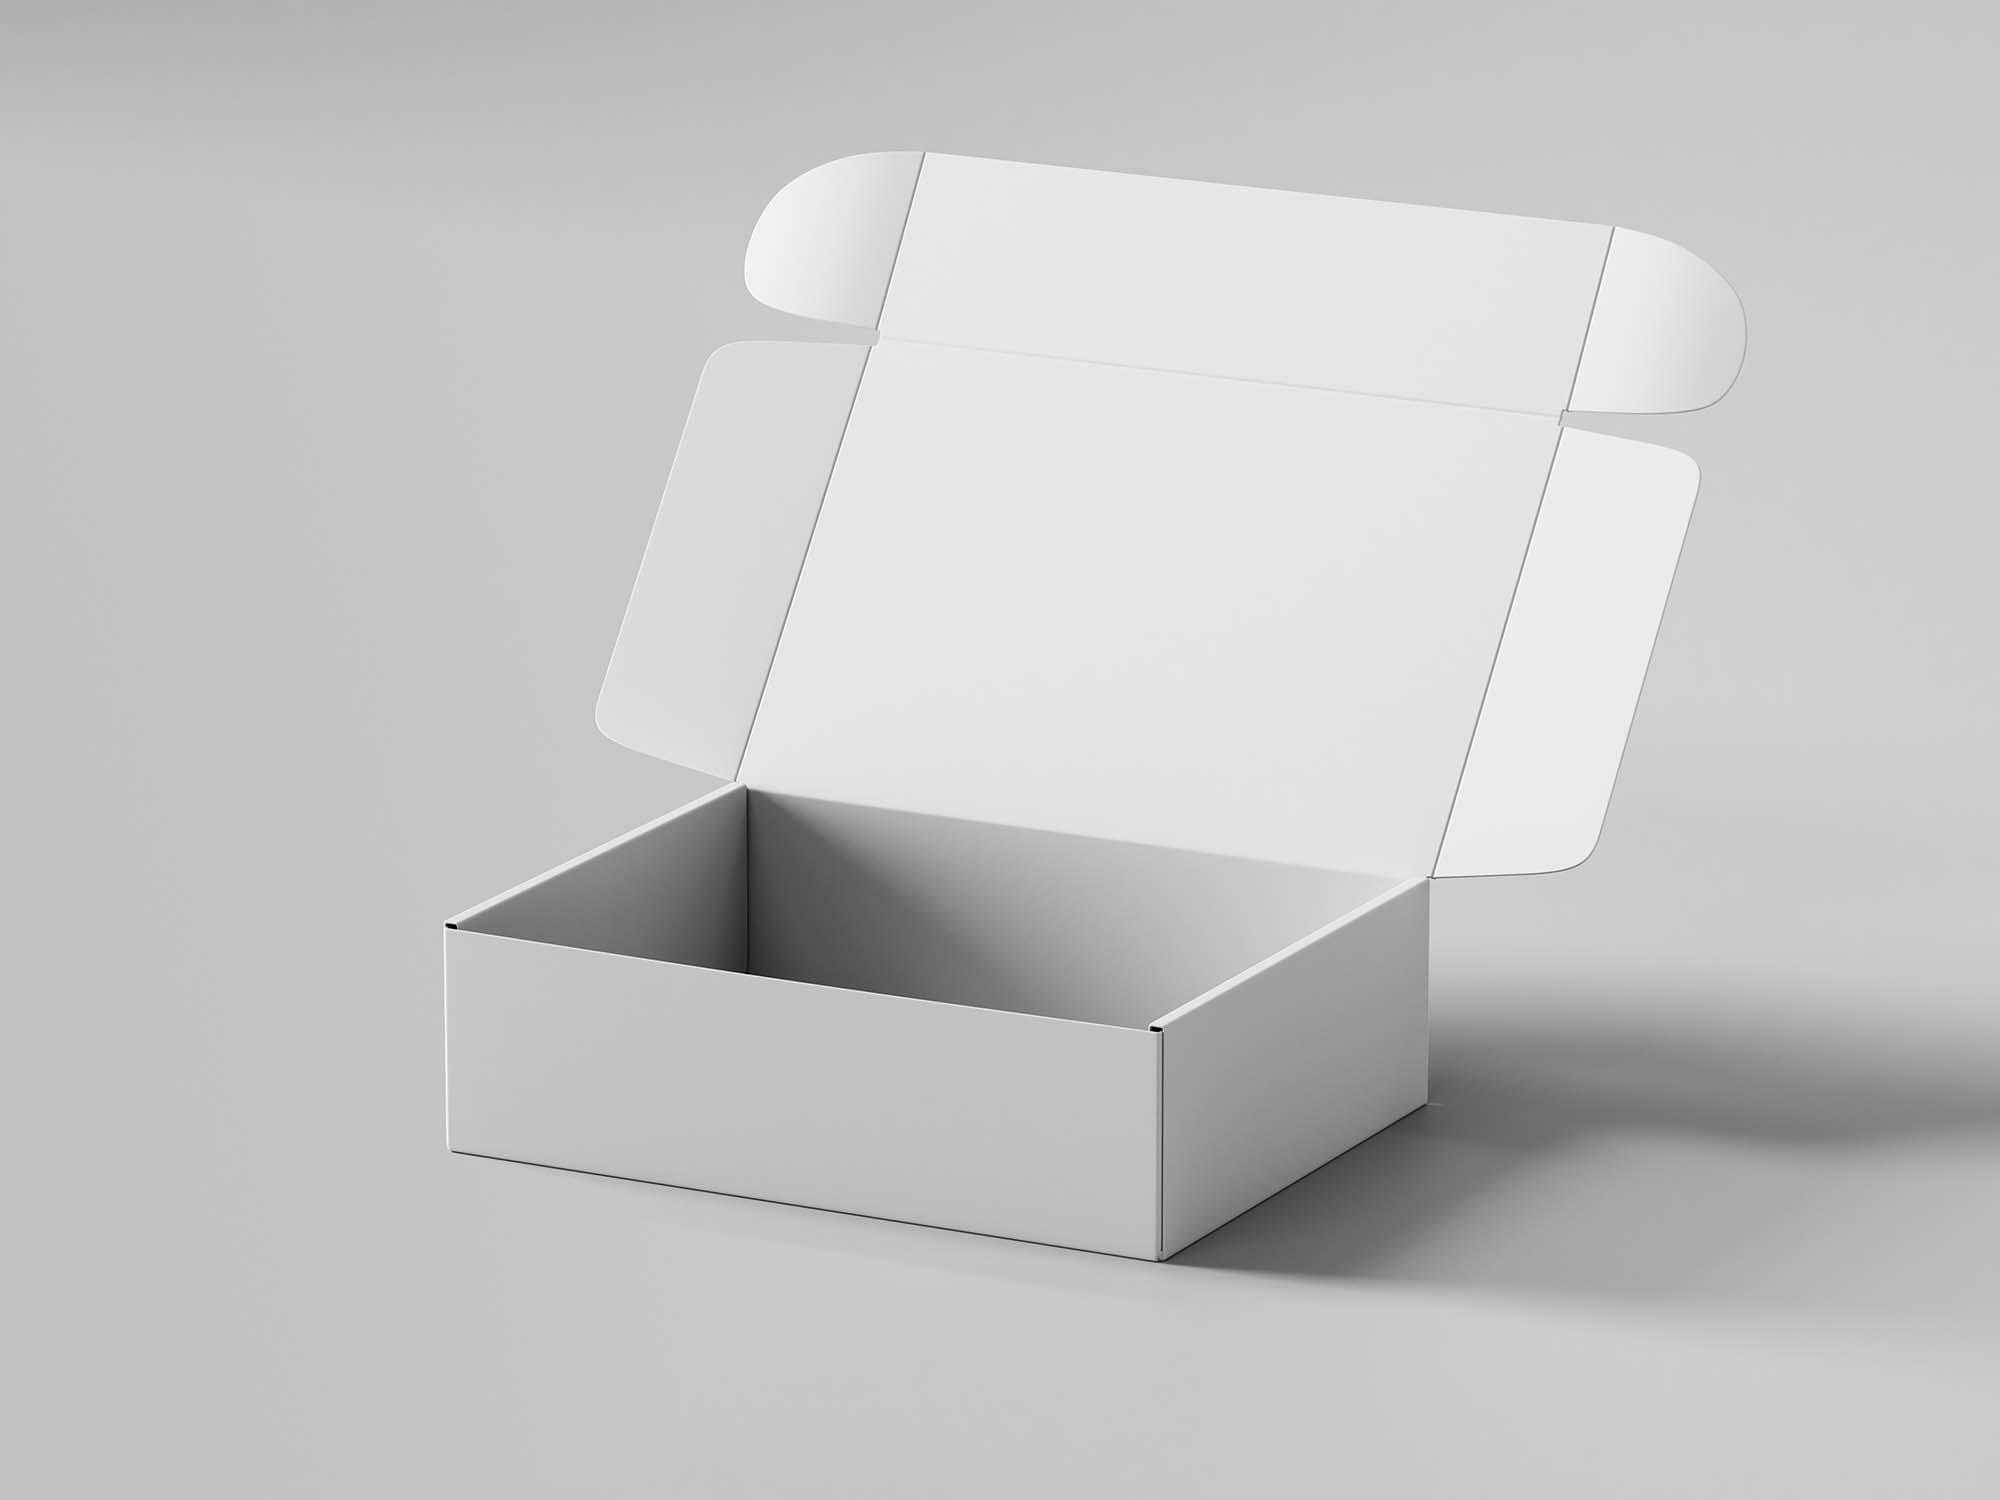 Pinch Lock Box Mockup 2